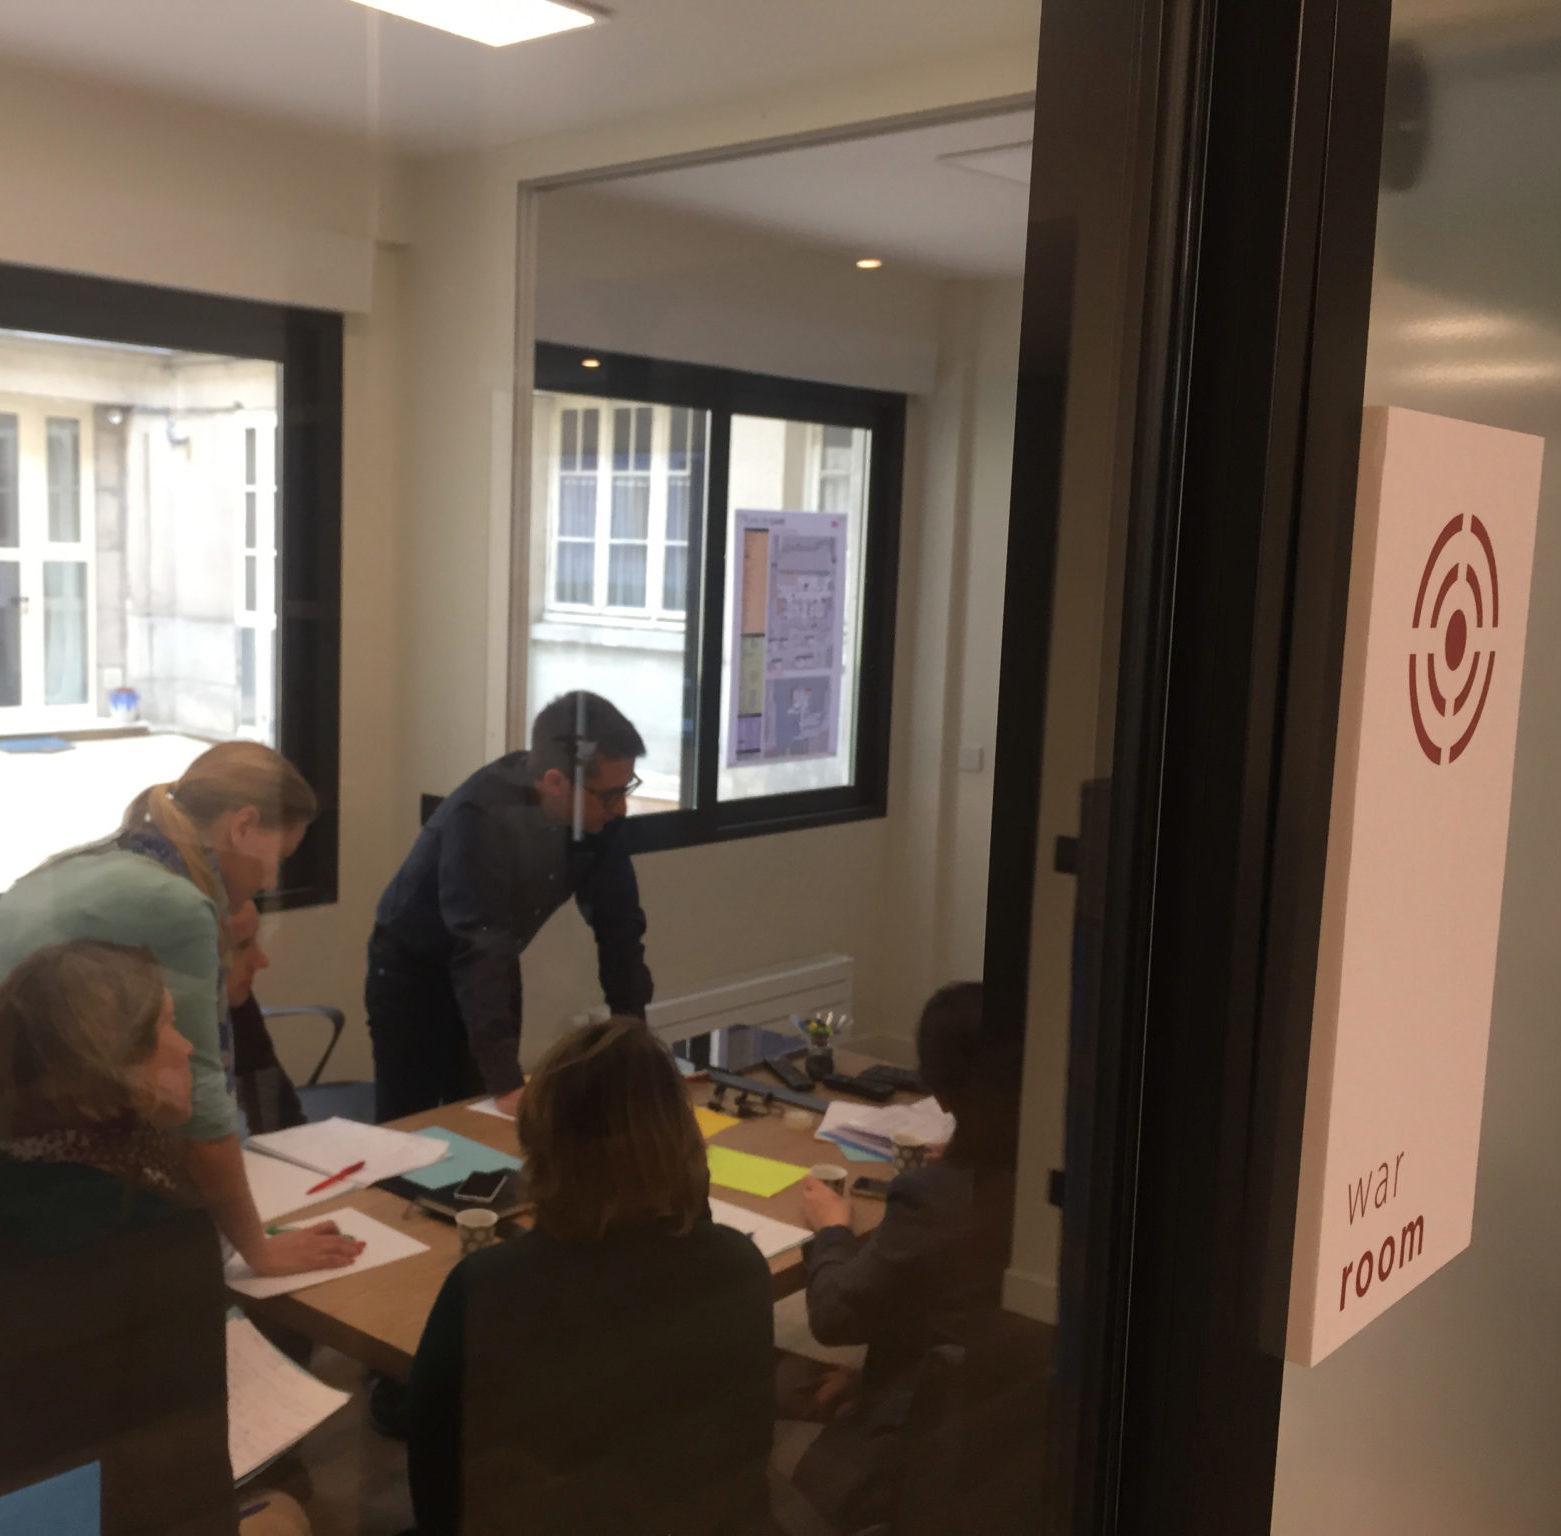 War Room formation dirigeants entreprise teambuilding leadership Pegasus Lorient